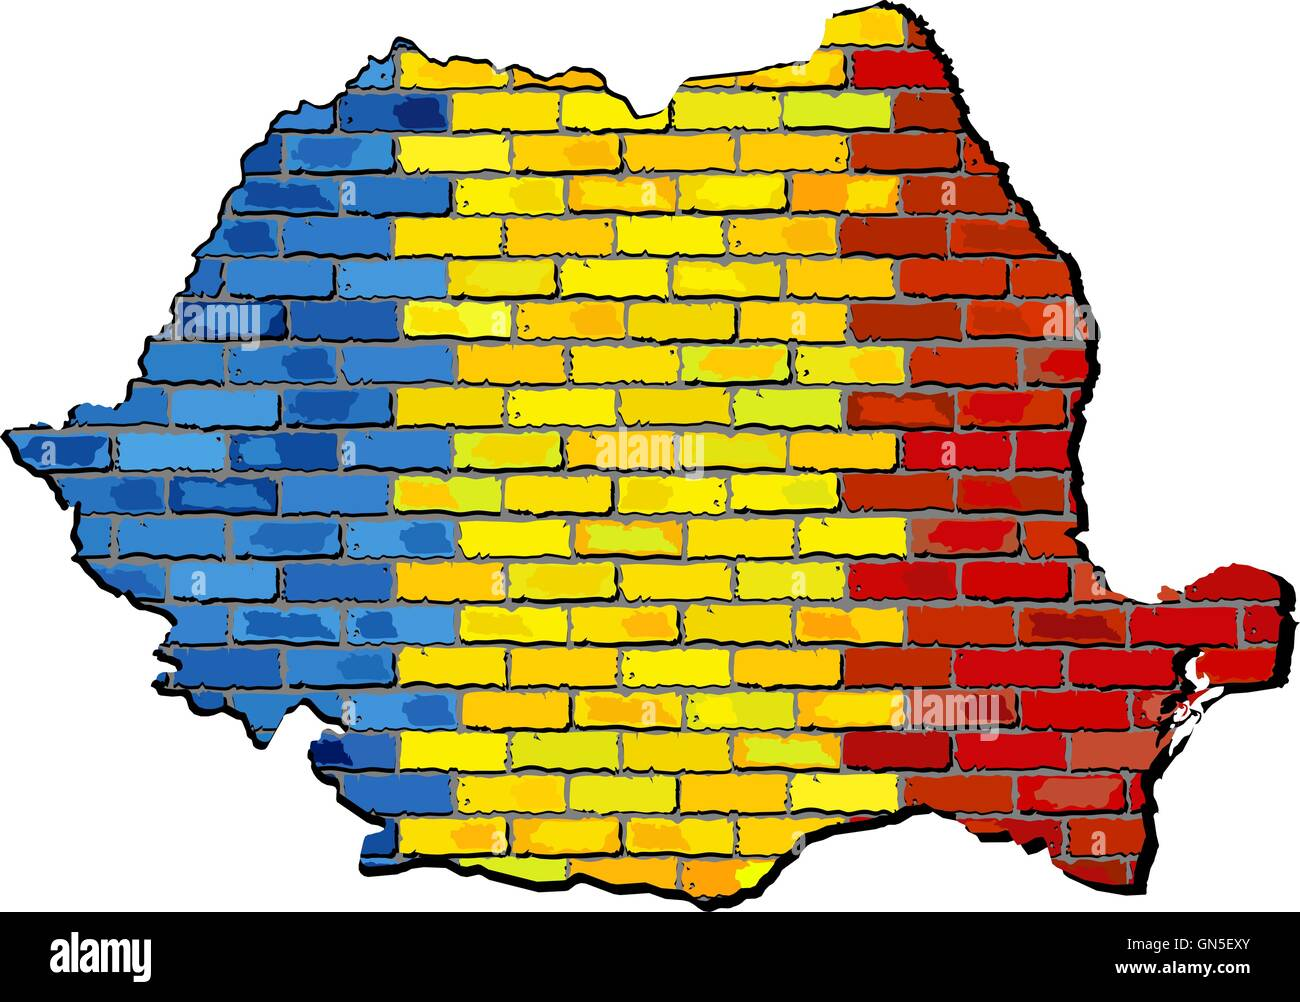 Romania map on a brick wall Stock Vector Art & Illustration, Vector ...